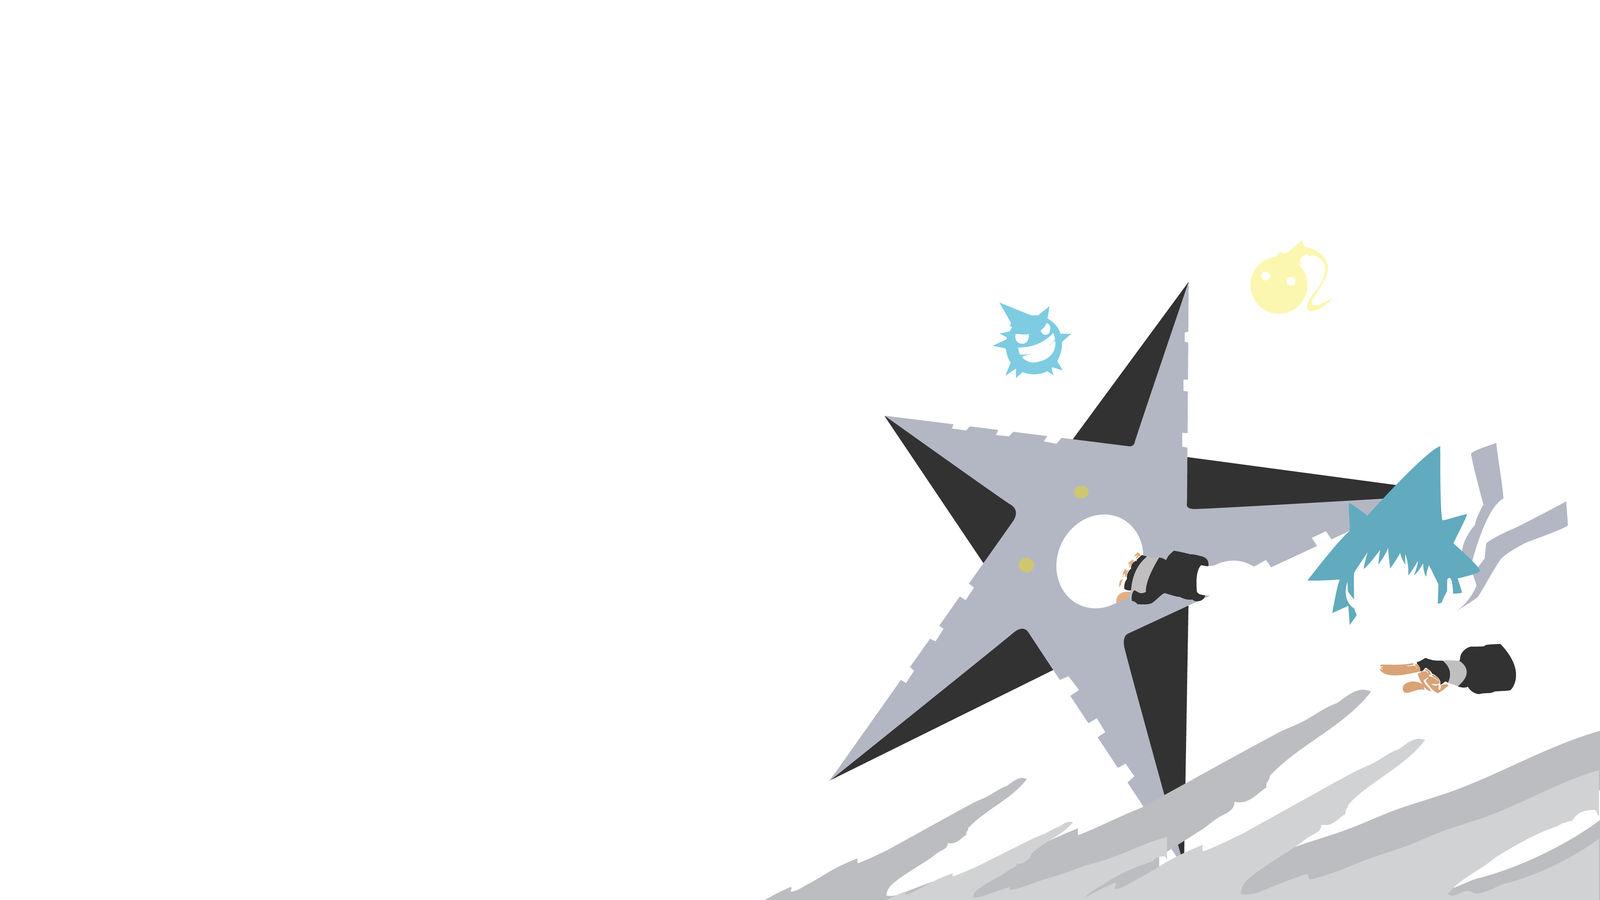 Soul Eater Black Star Wallpaper By Thefancy On Deviantart